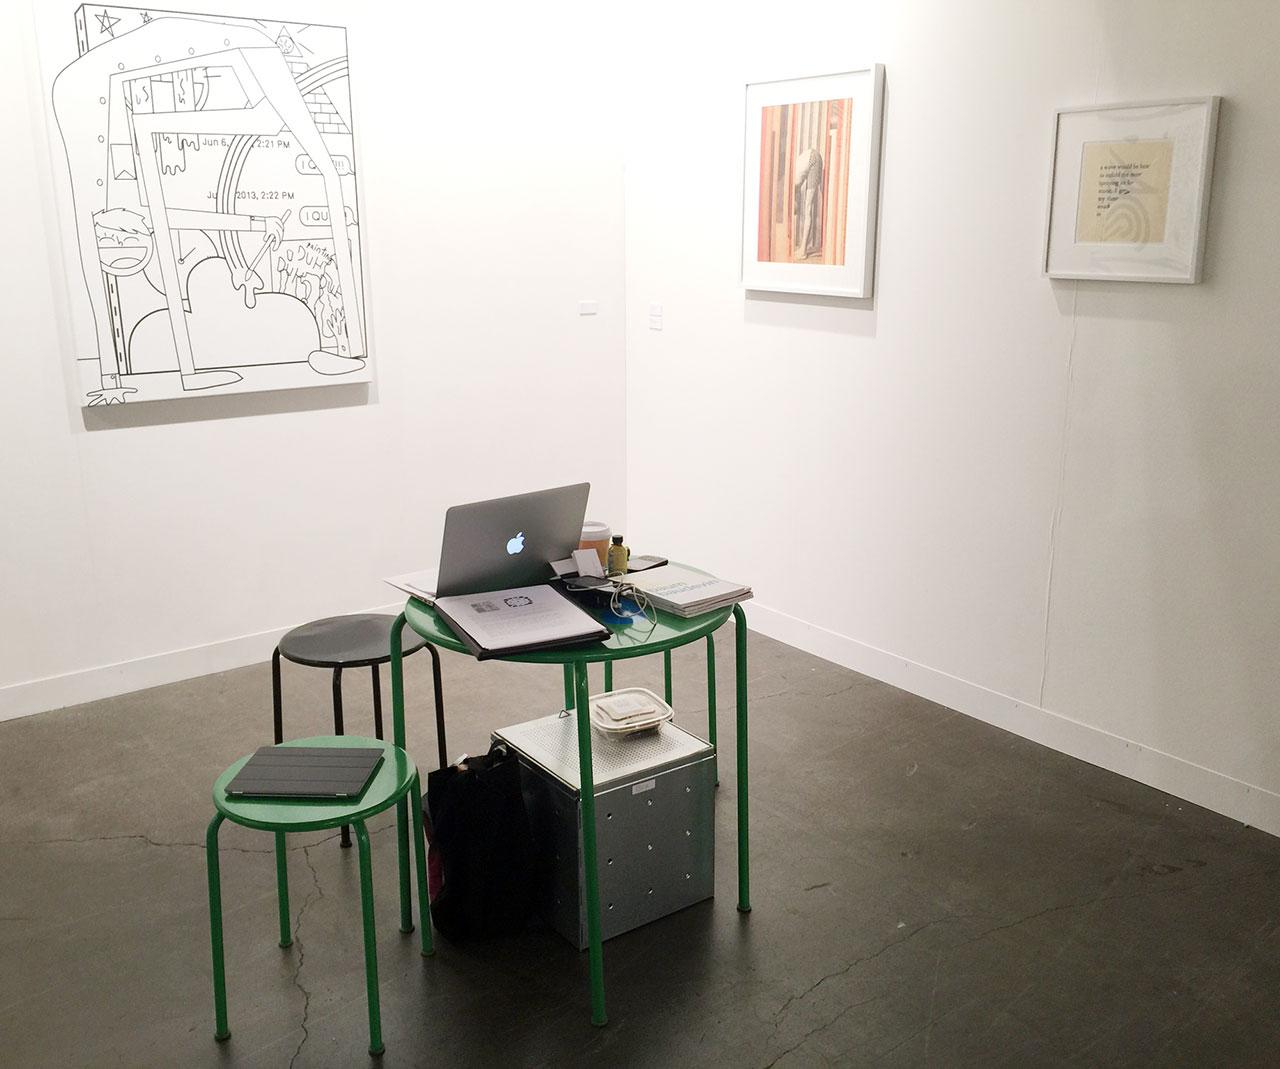 No nonsense at New York's Bureau gallery